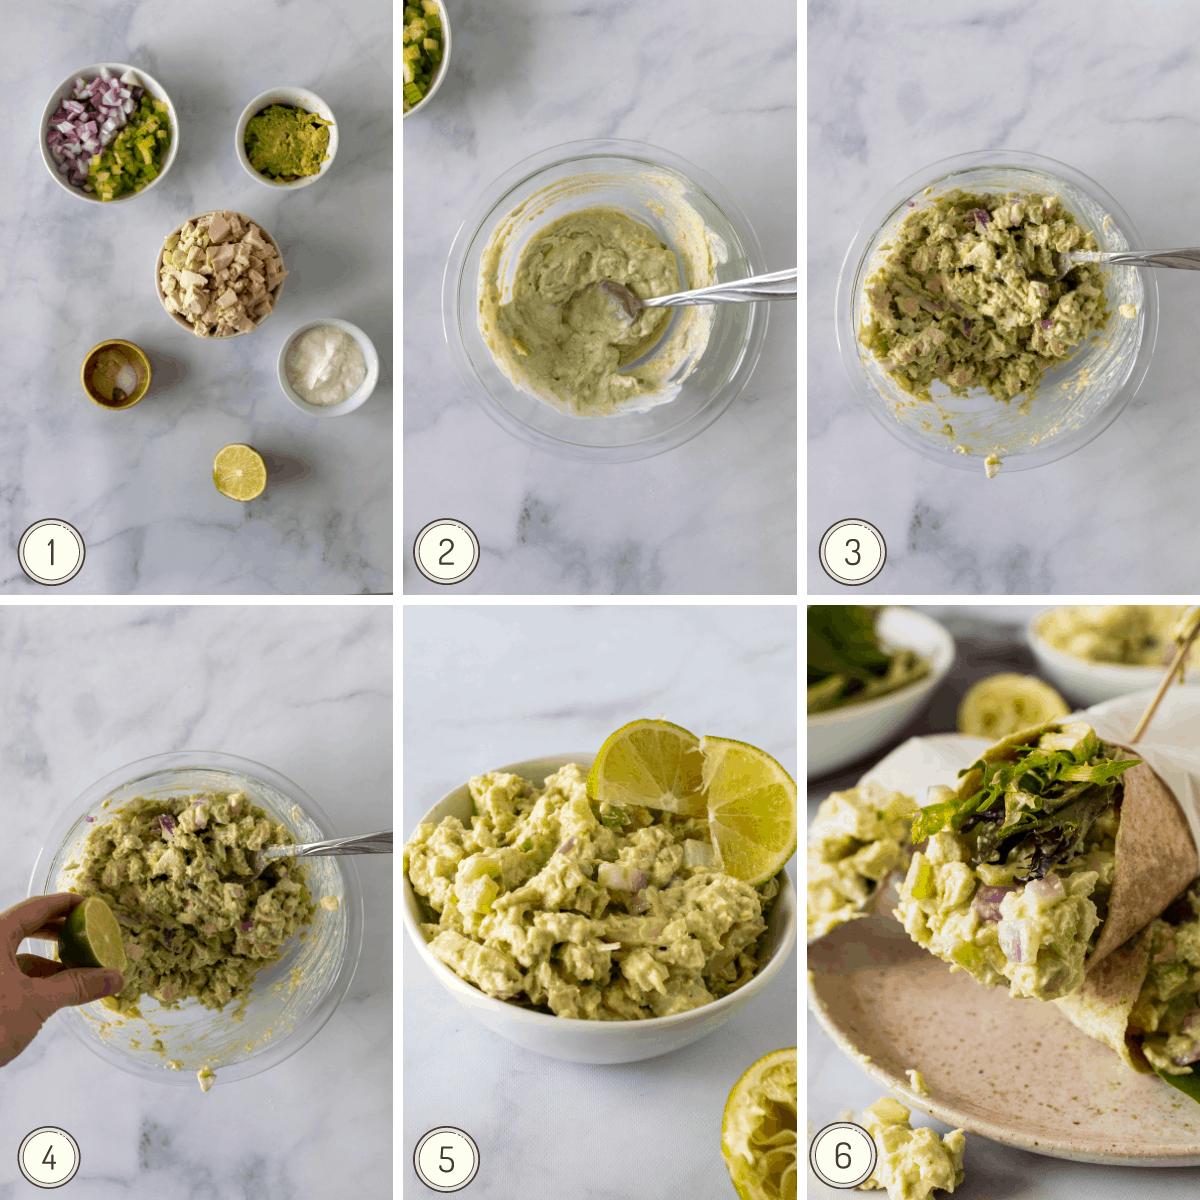 step by step collage showing how to make Greek yogurt chicken salad.